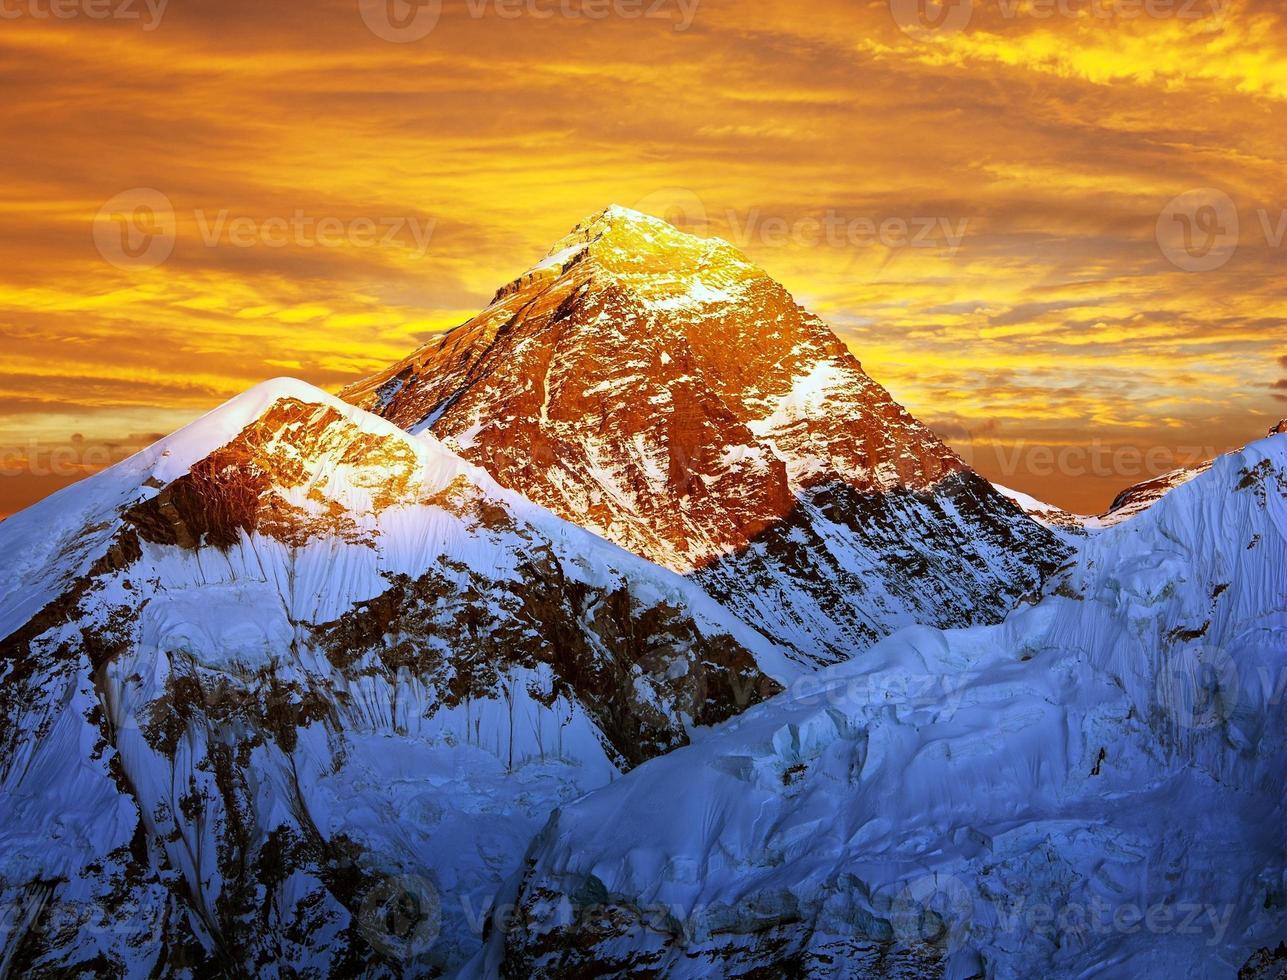 Vista coloreada del Everest desde Kala Patthar - Nepal foto